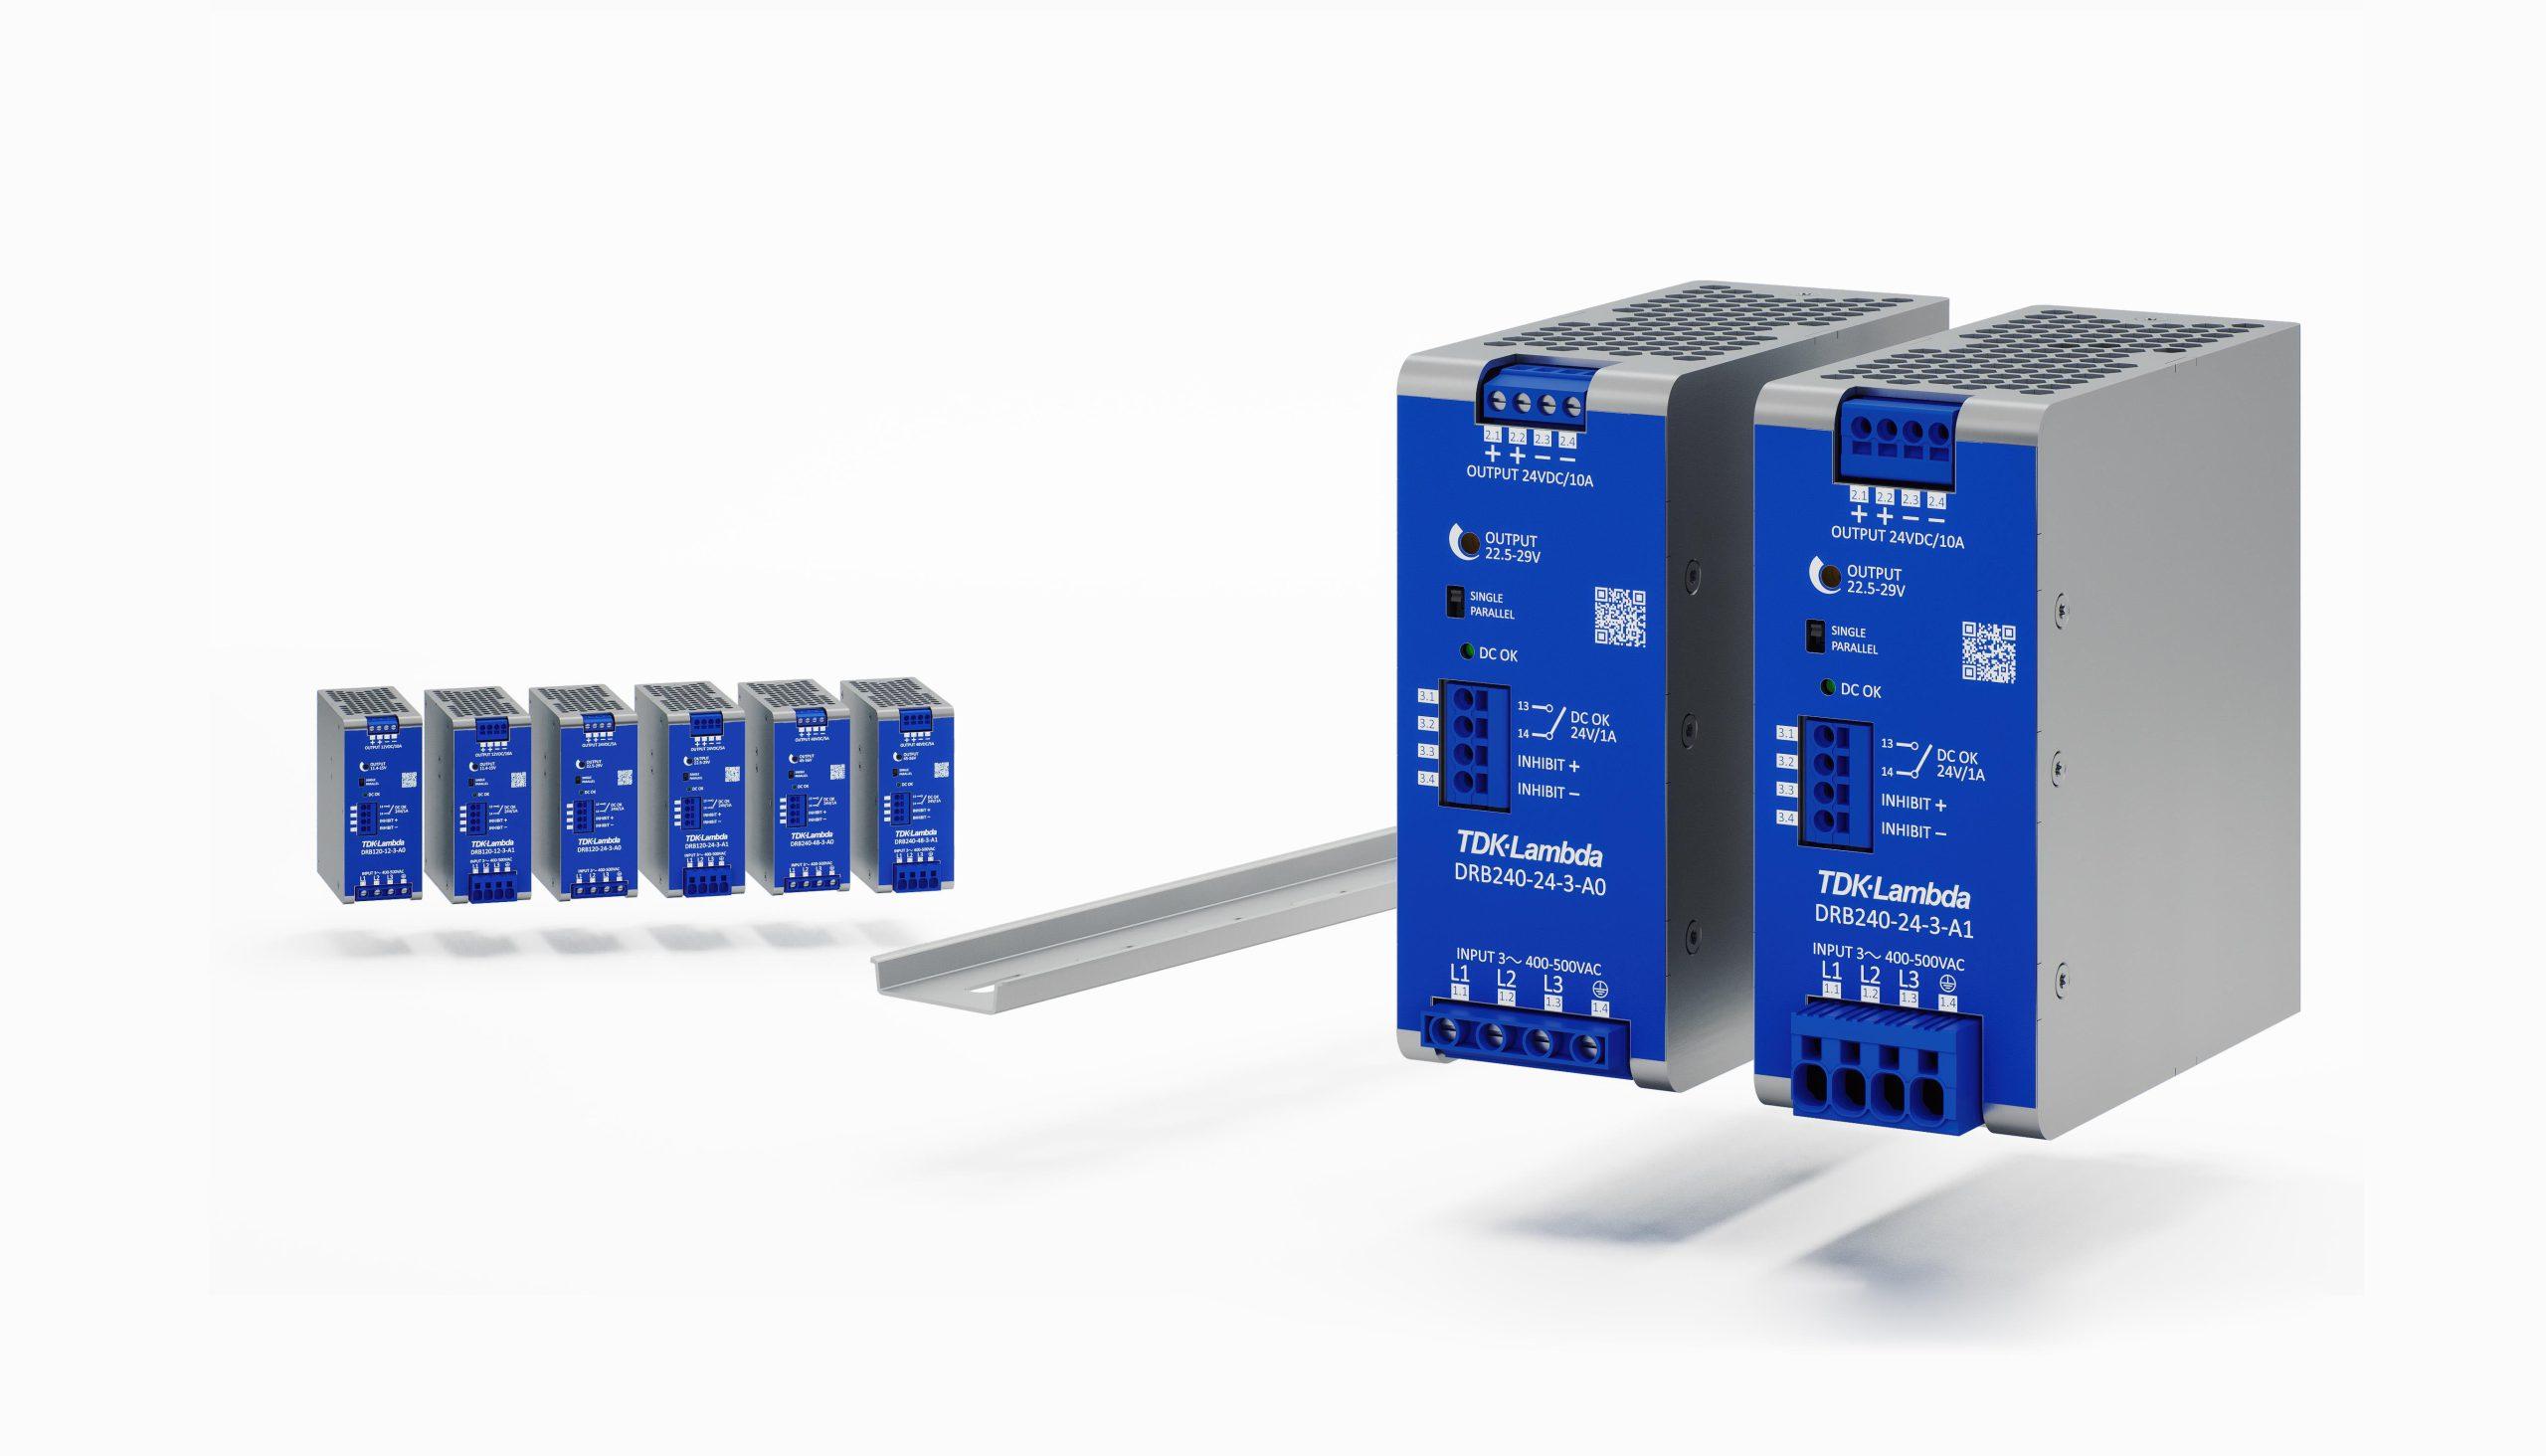 Kompakte Netzteile mit Dreiphaseneingang